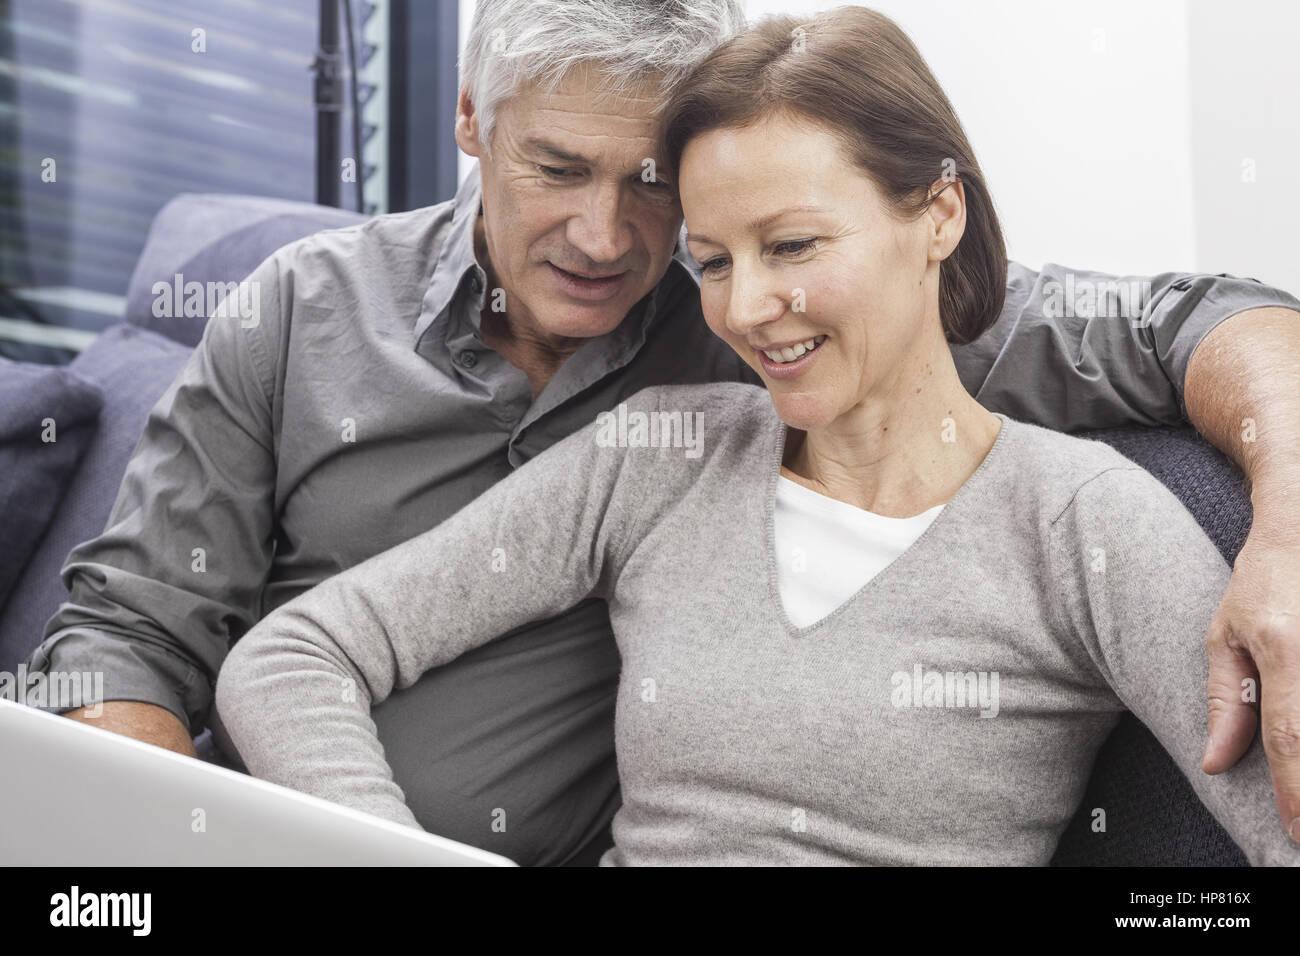 Paar sitzt auf Couch mit Laptop (model-released) Stock Photo